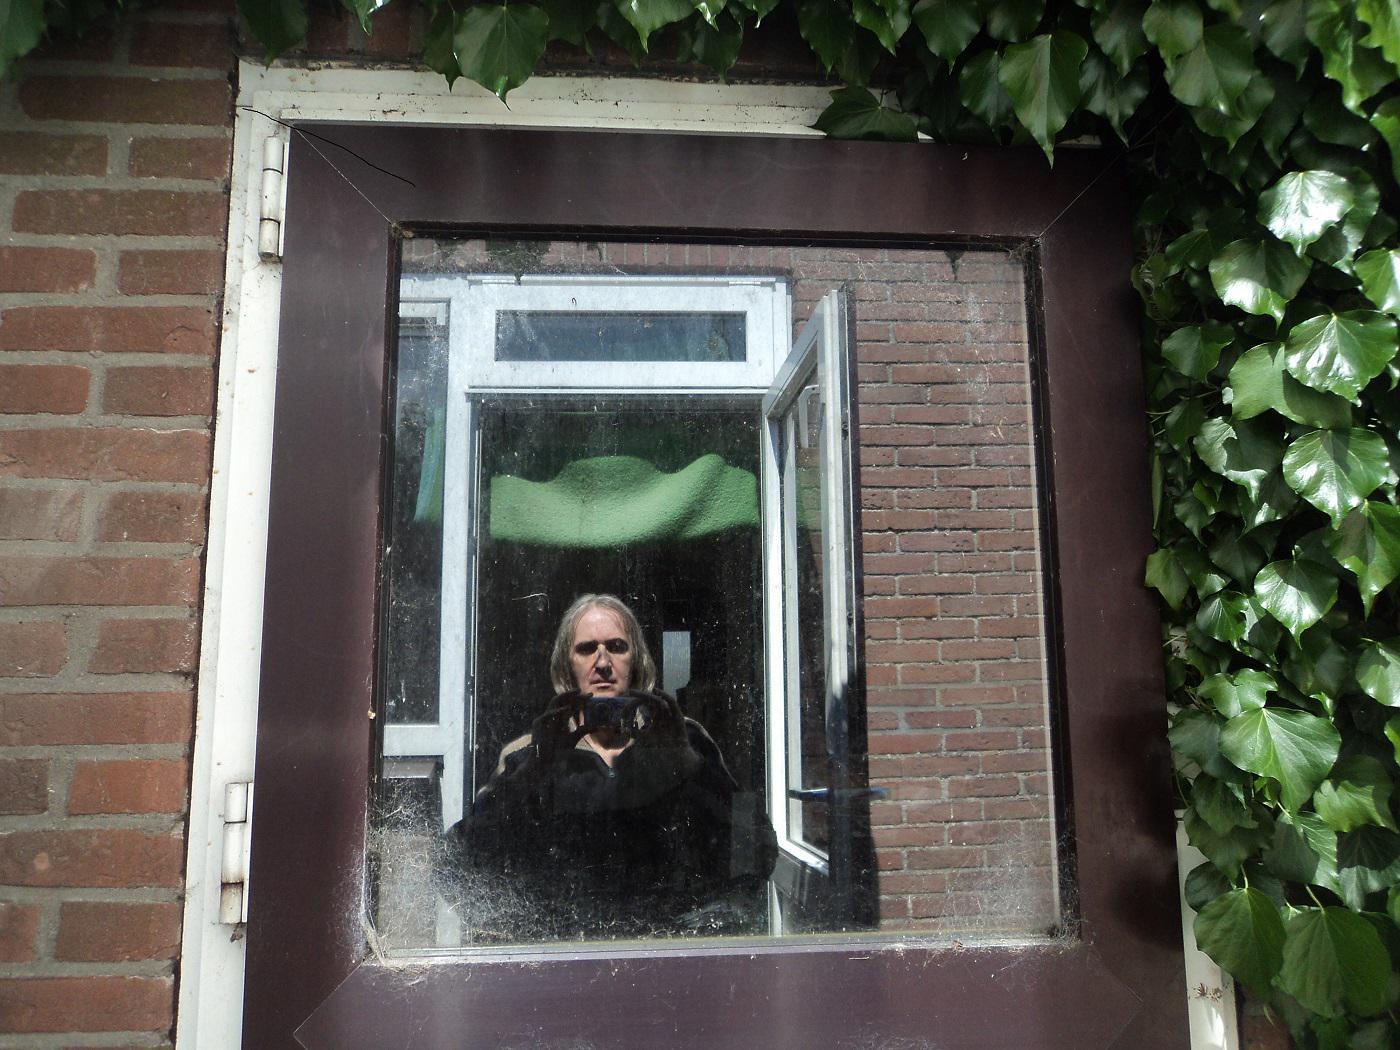 kl12345 uit Noord-Holland,Nederland